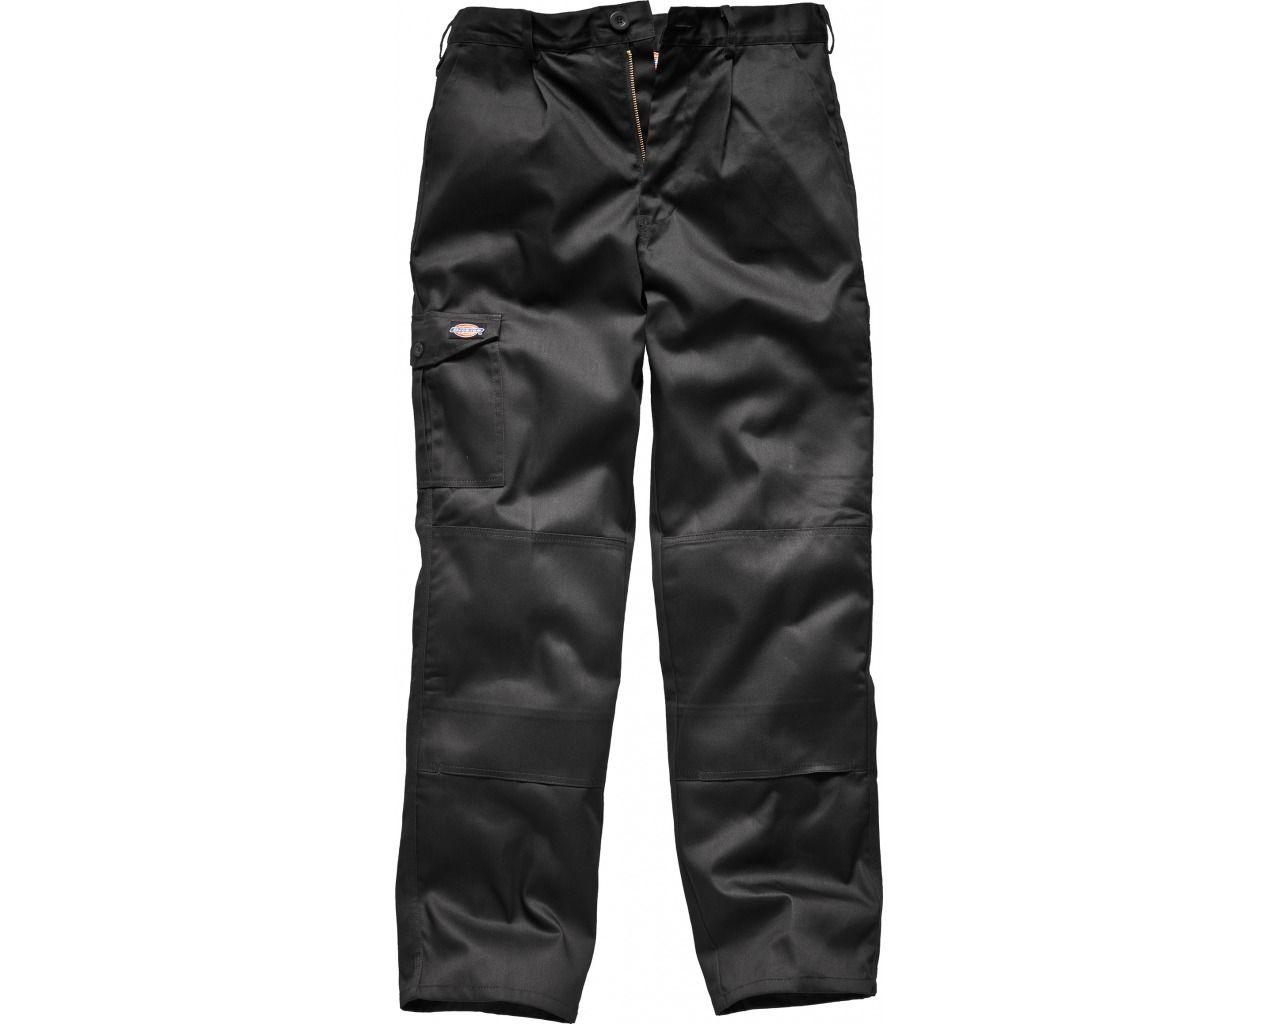 Dickies Redhawk Pantaloni Uomo Lavoro Pantalone Action Workwear-wd814